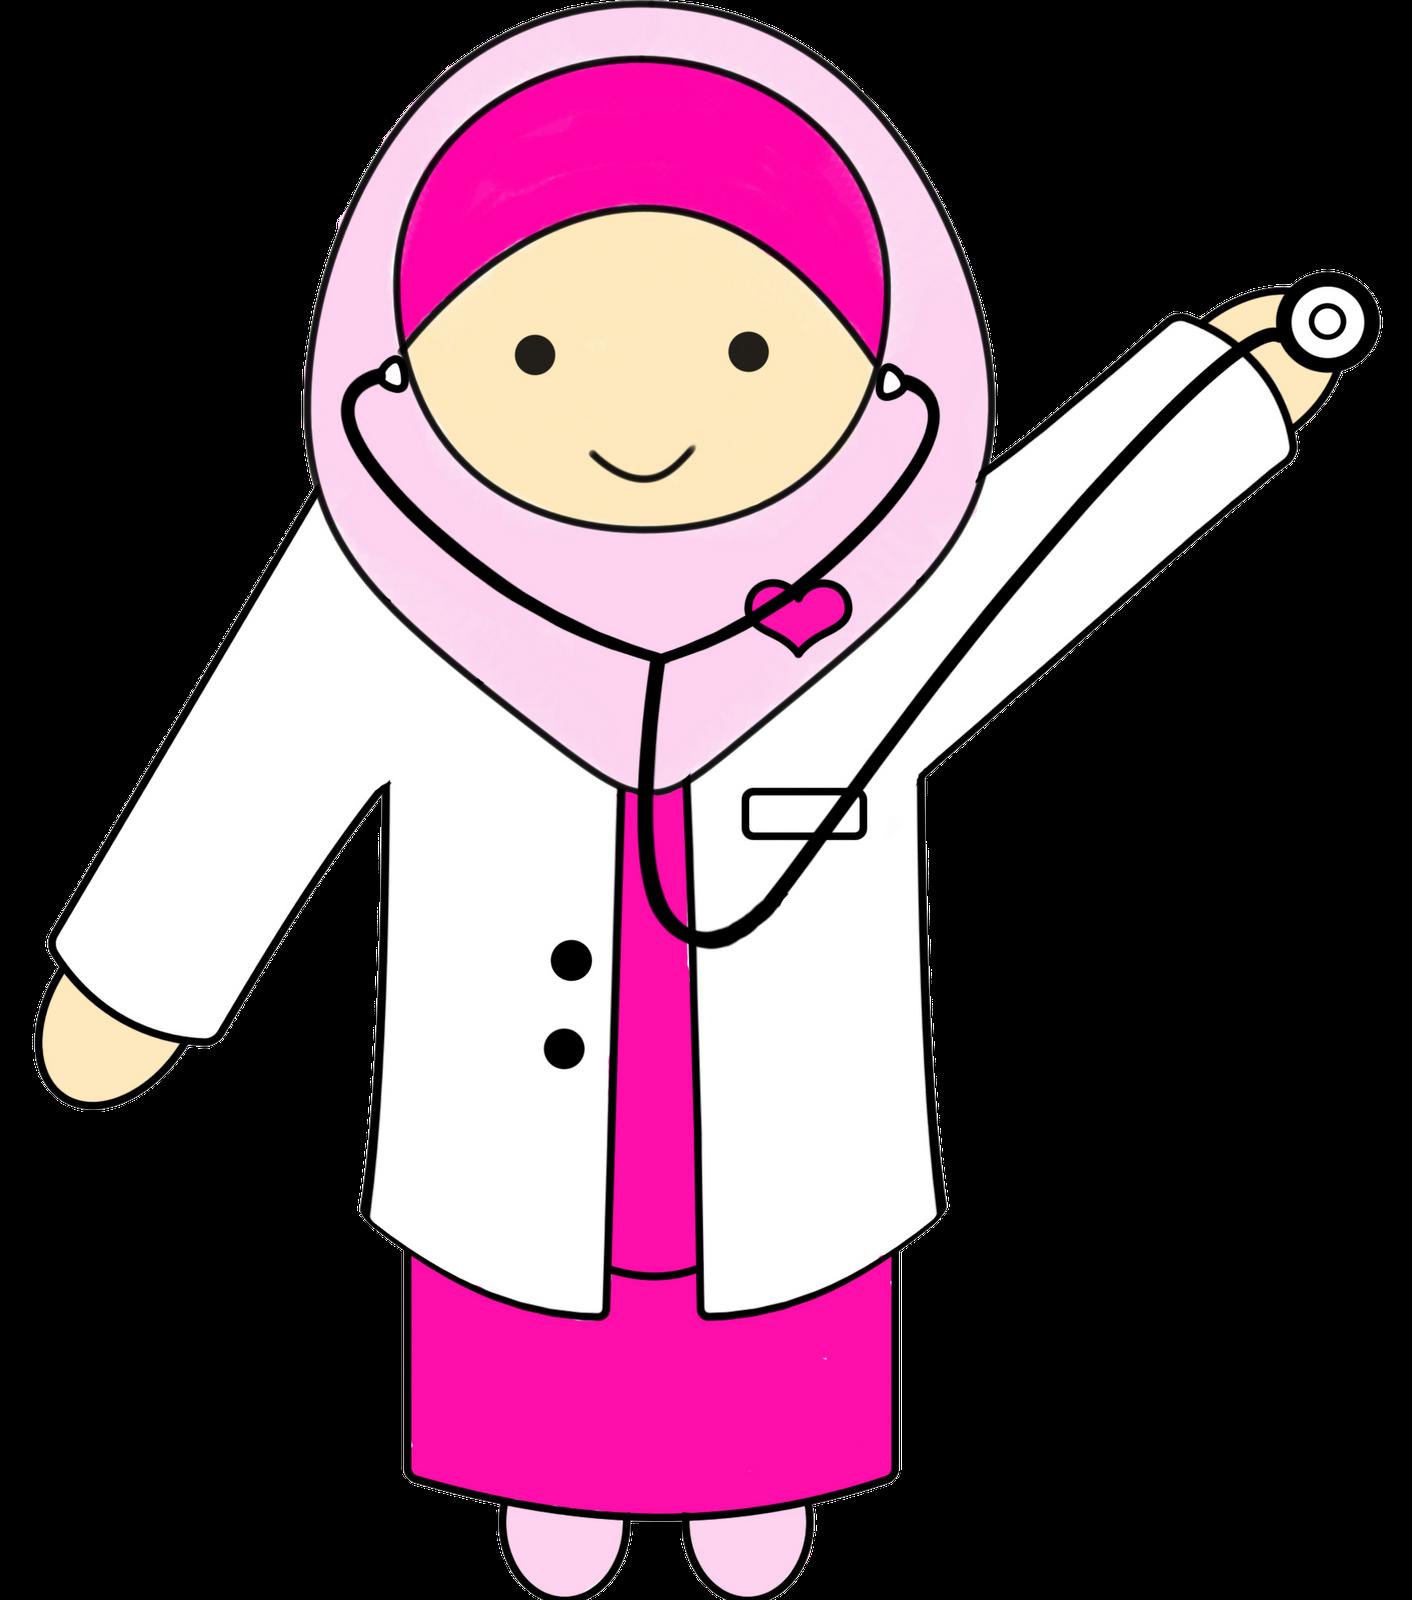 Pin Kartun Muslimah Sedang Berdoa Cachedgambar Gambar Cake